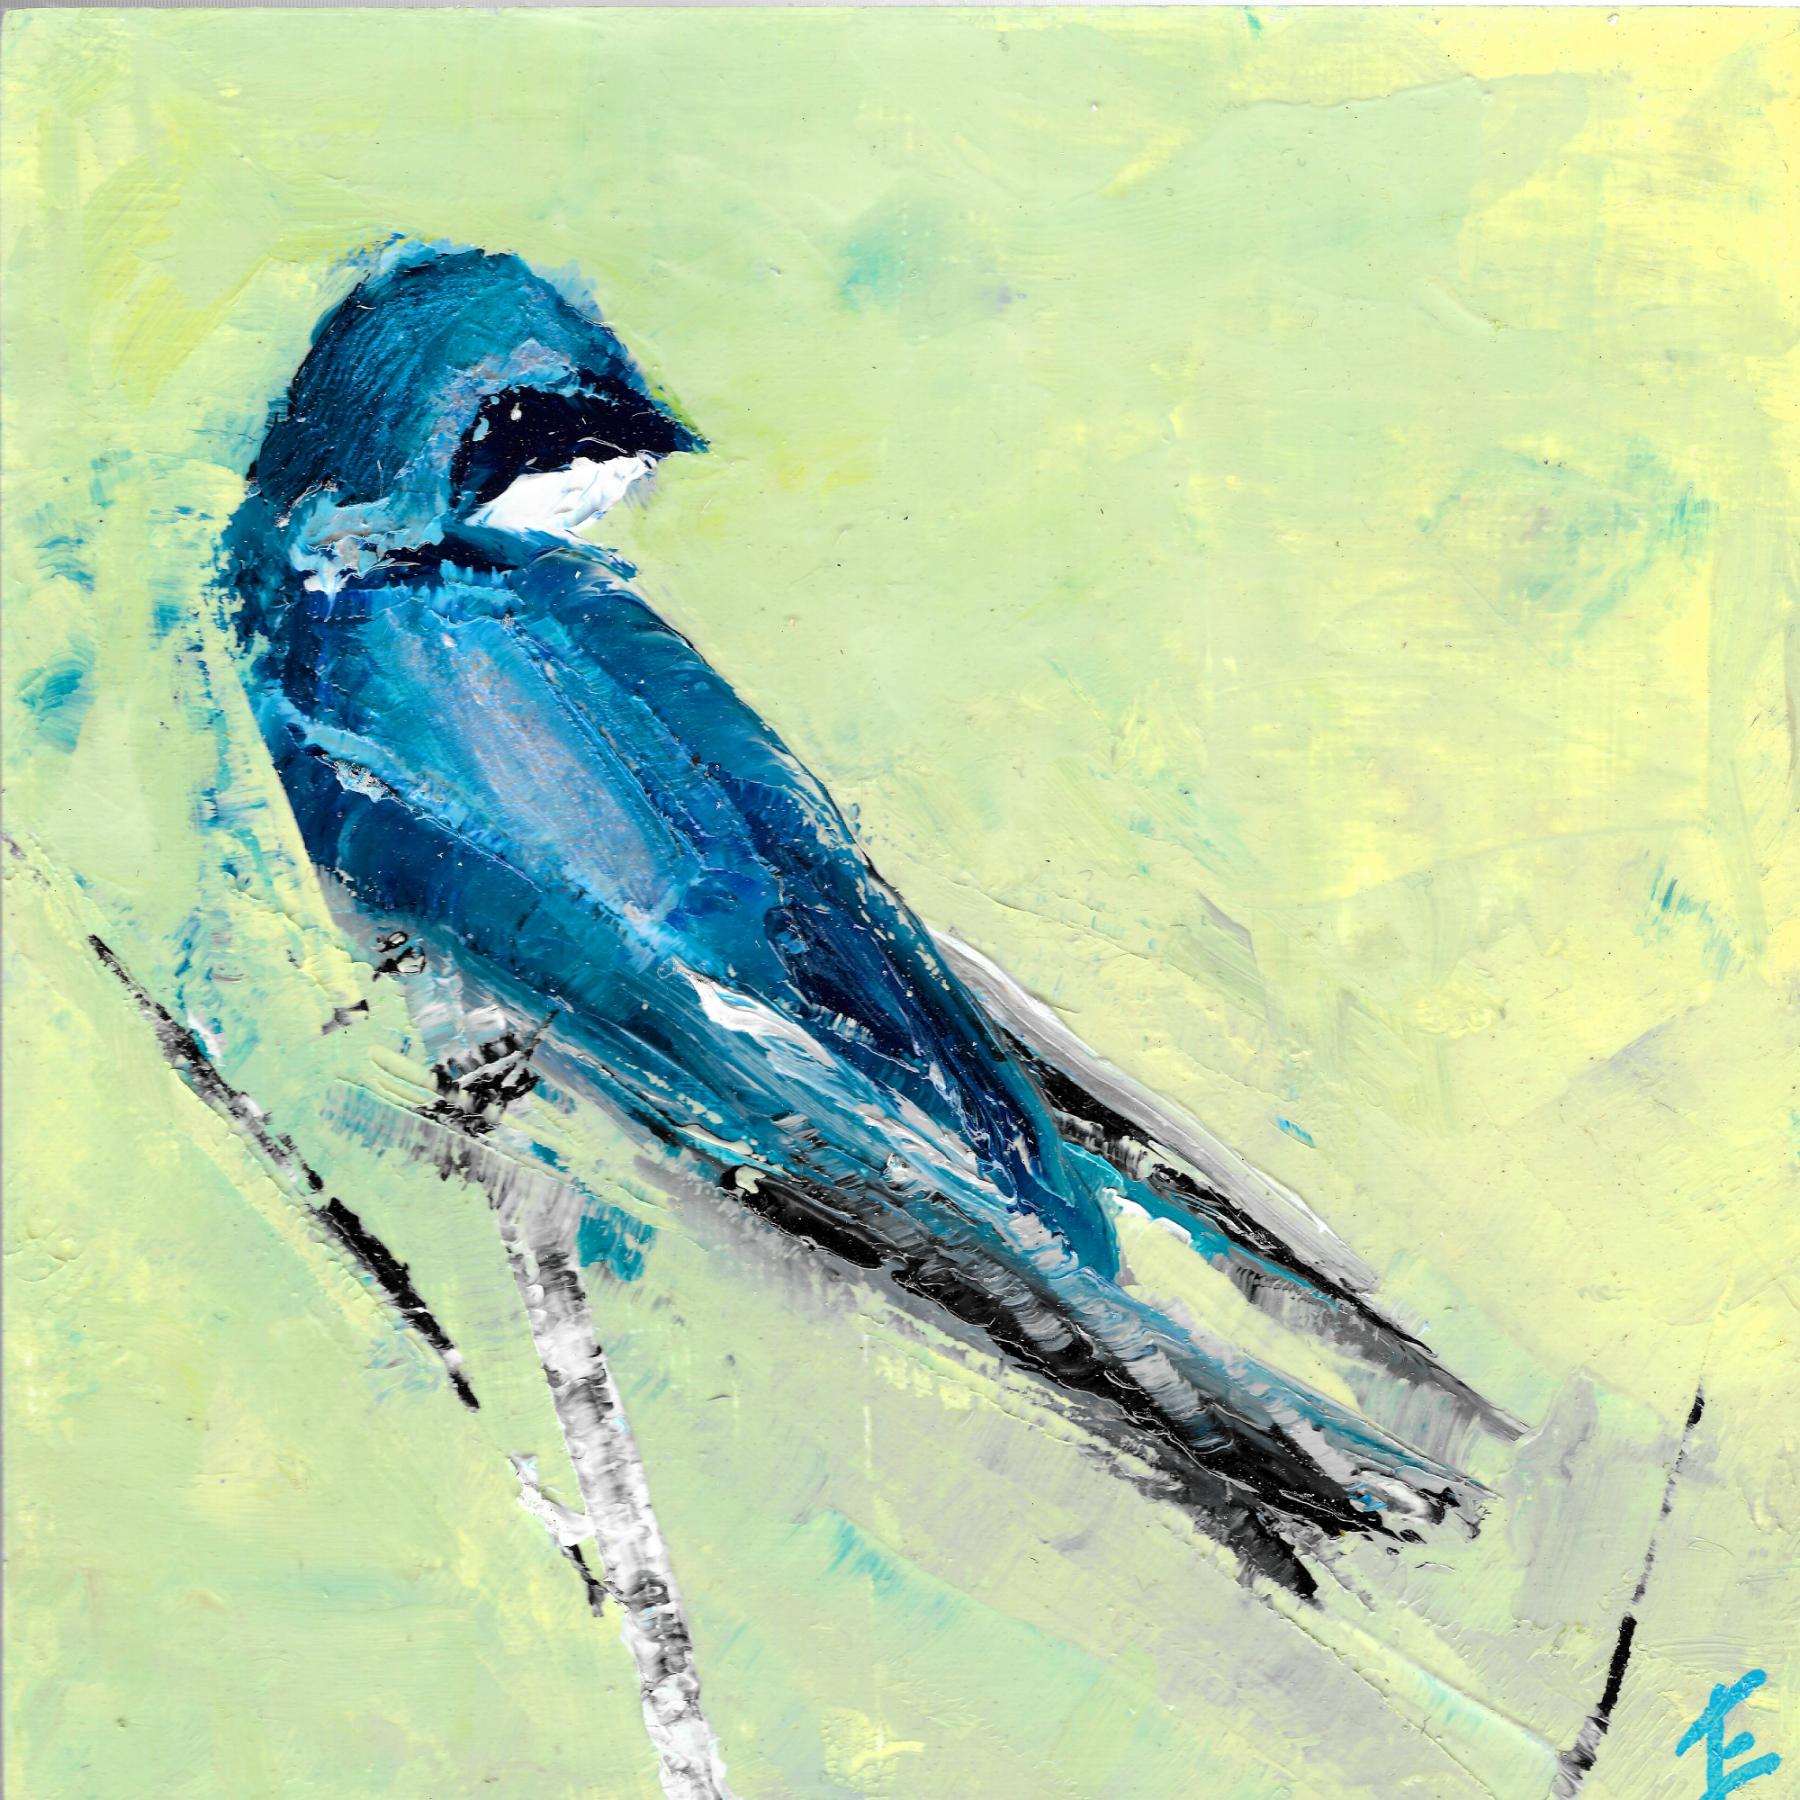 Tree Swallow 3